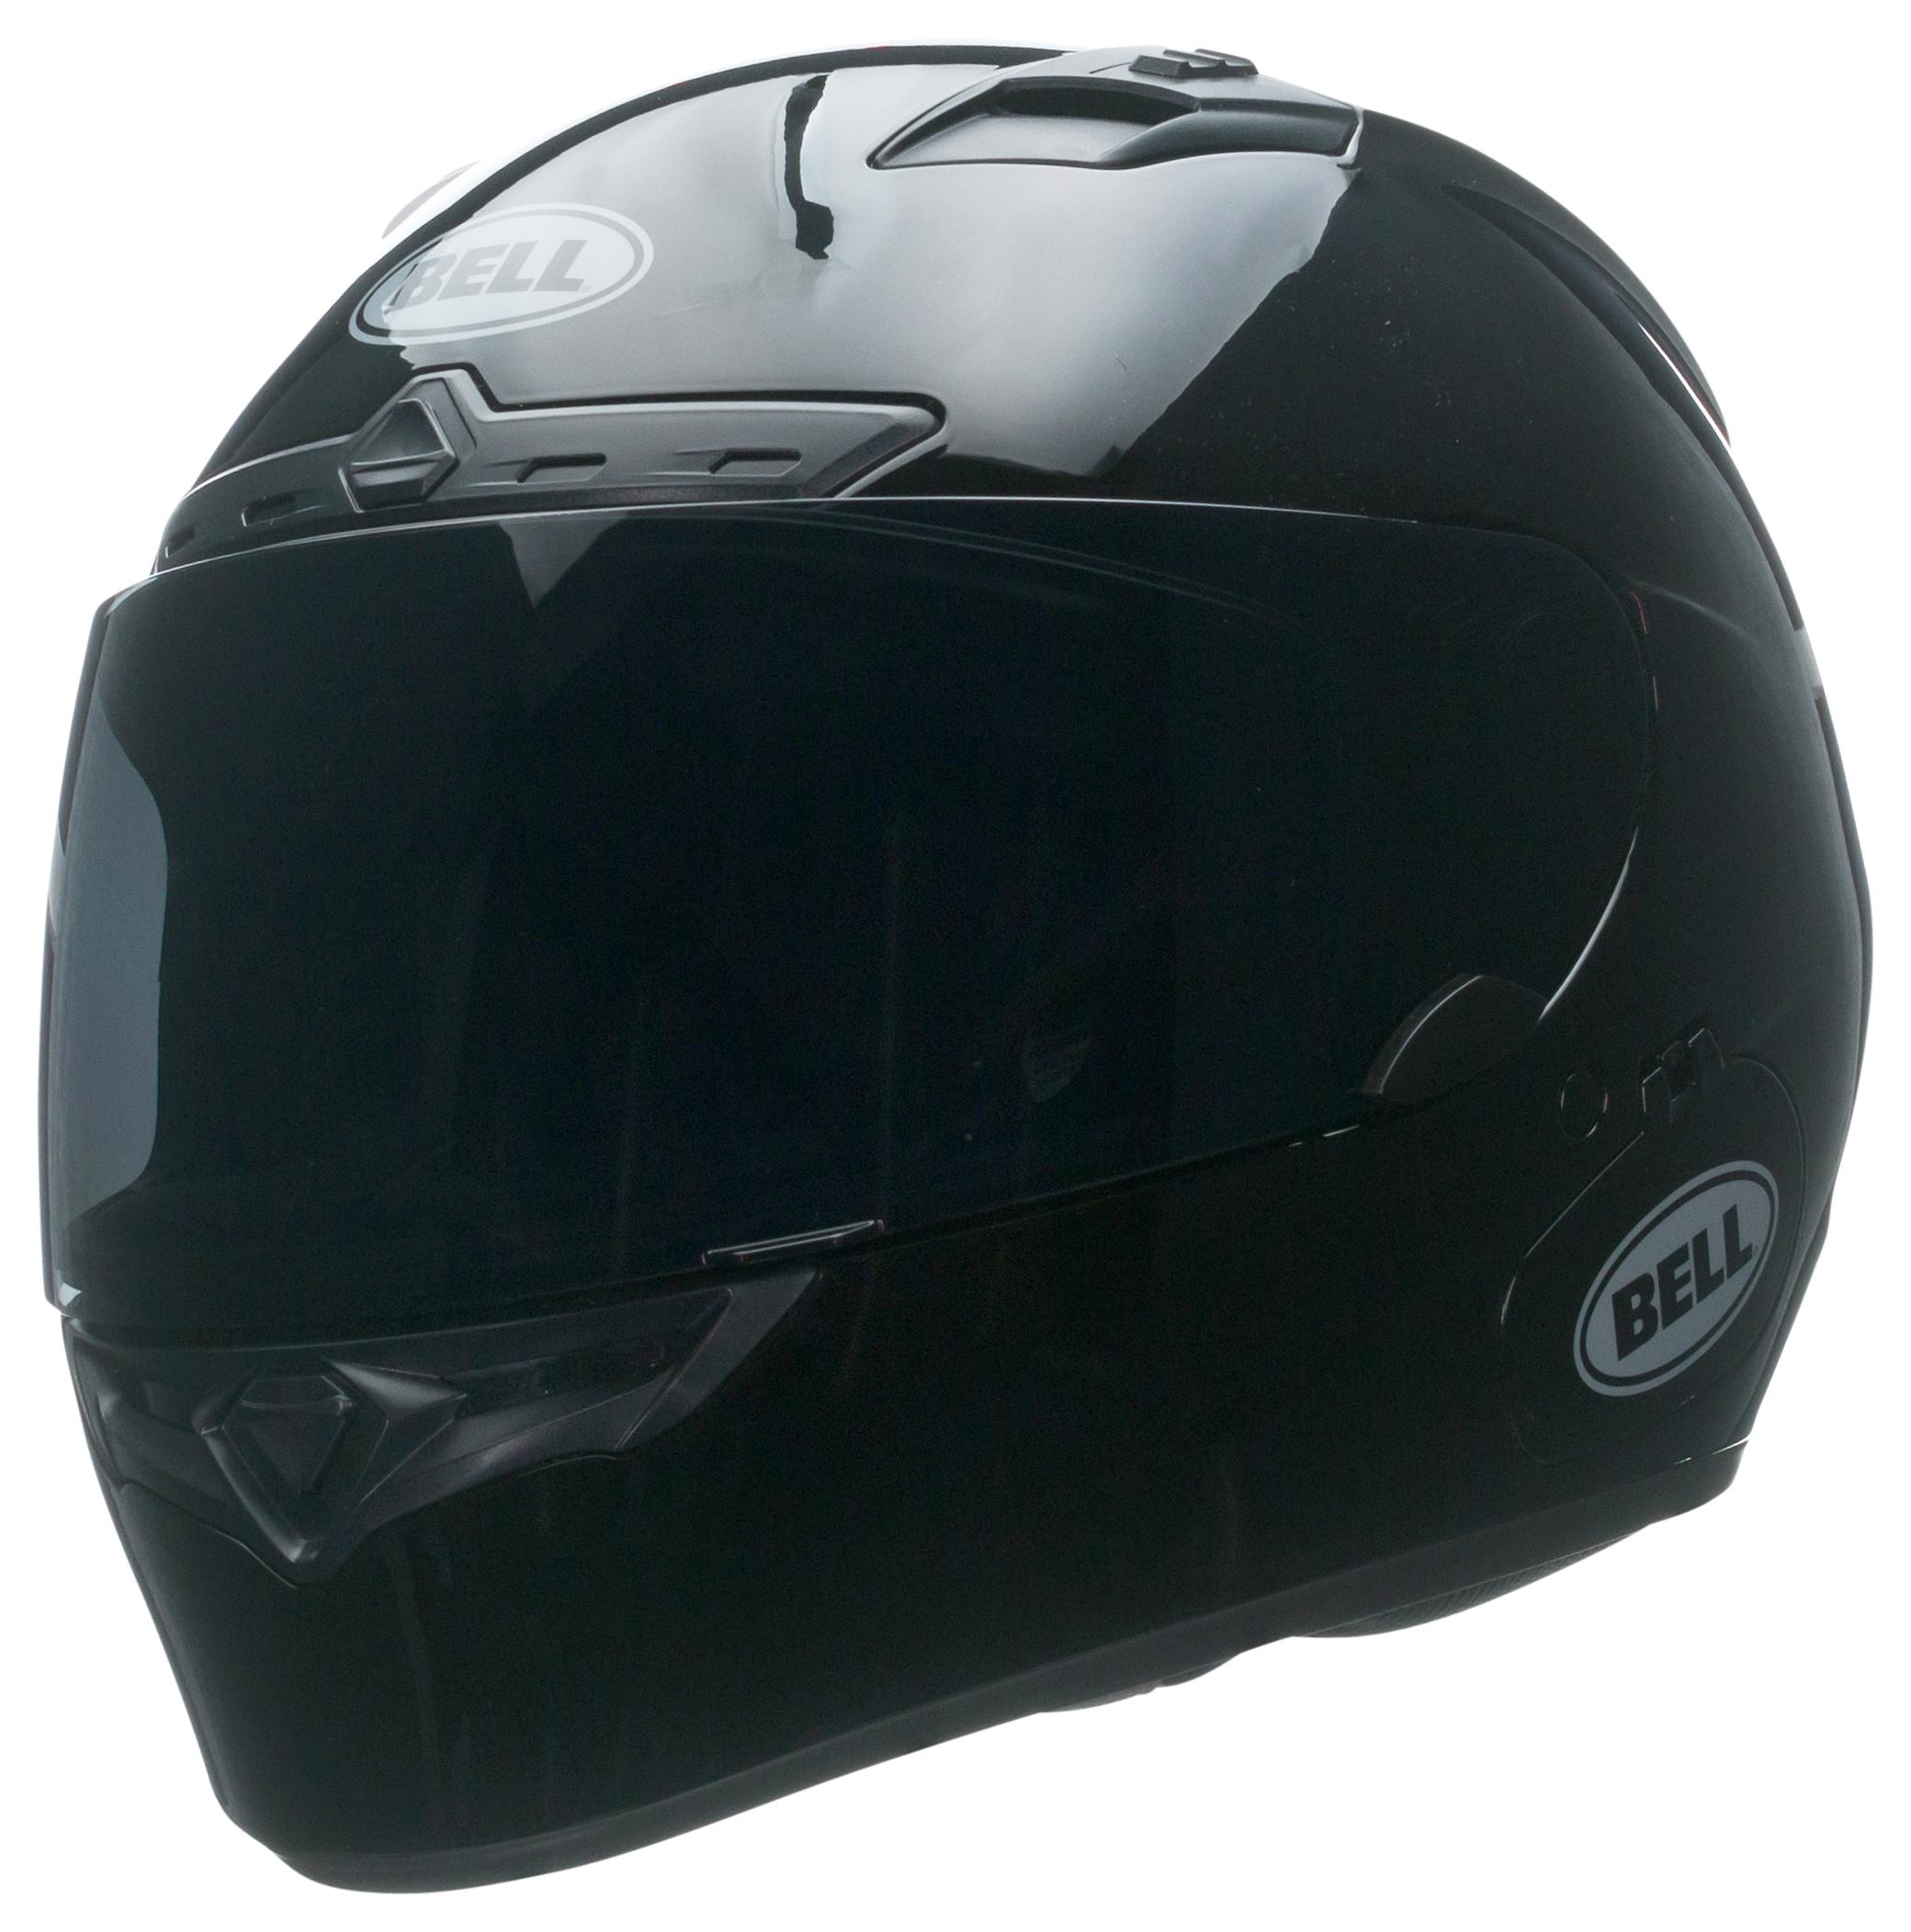 3869153dafce6 Bell Qualifier DLX Helmet (LG)